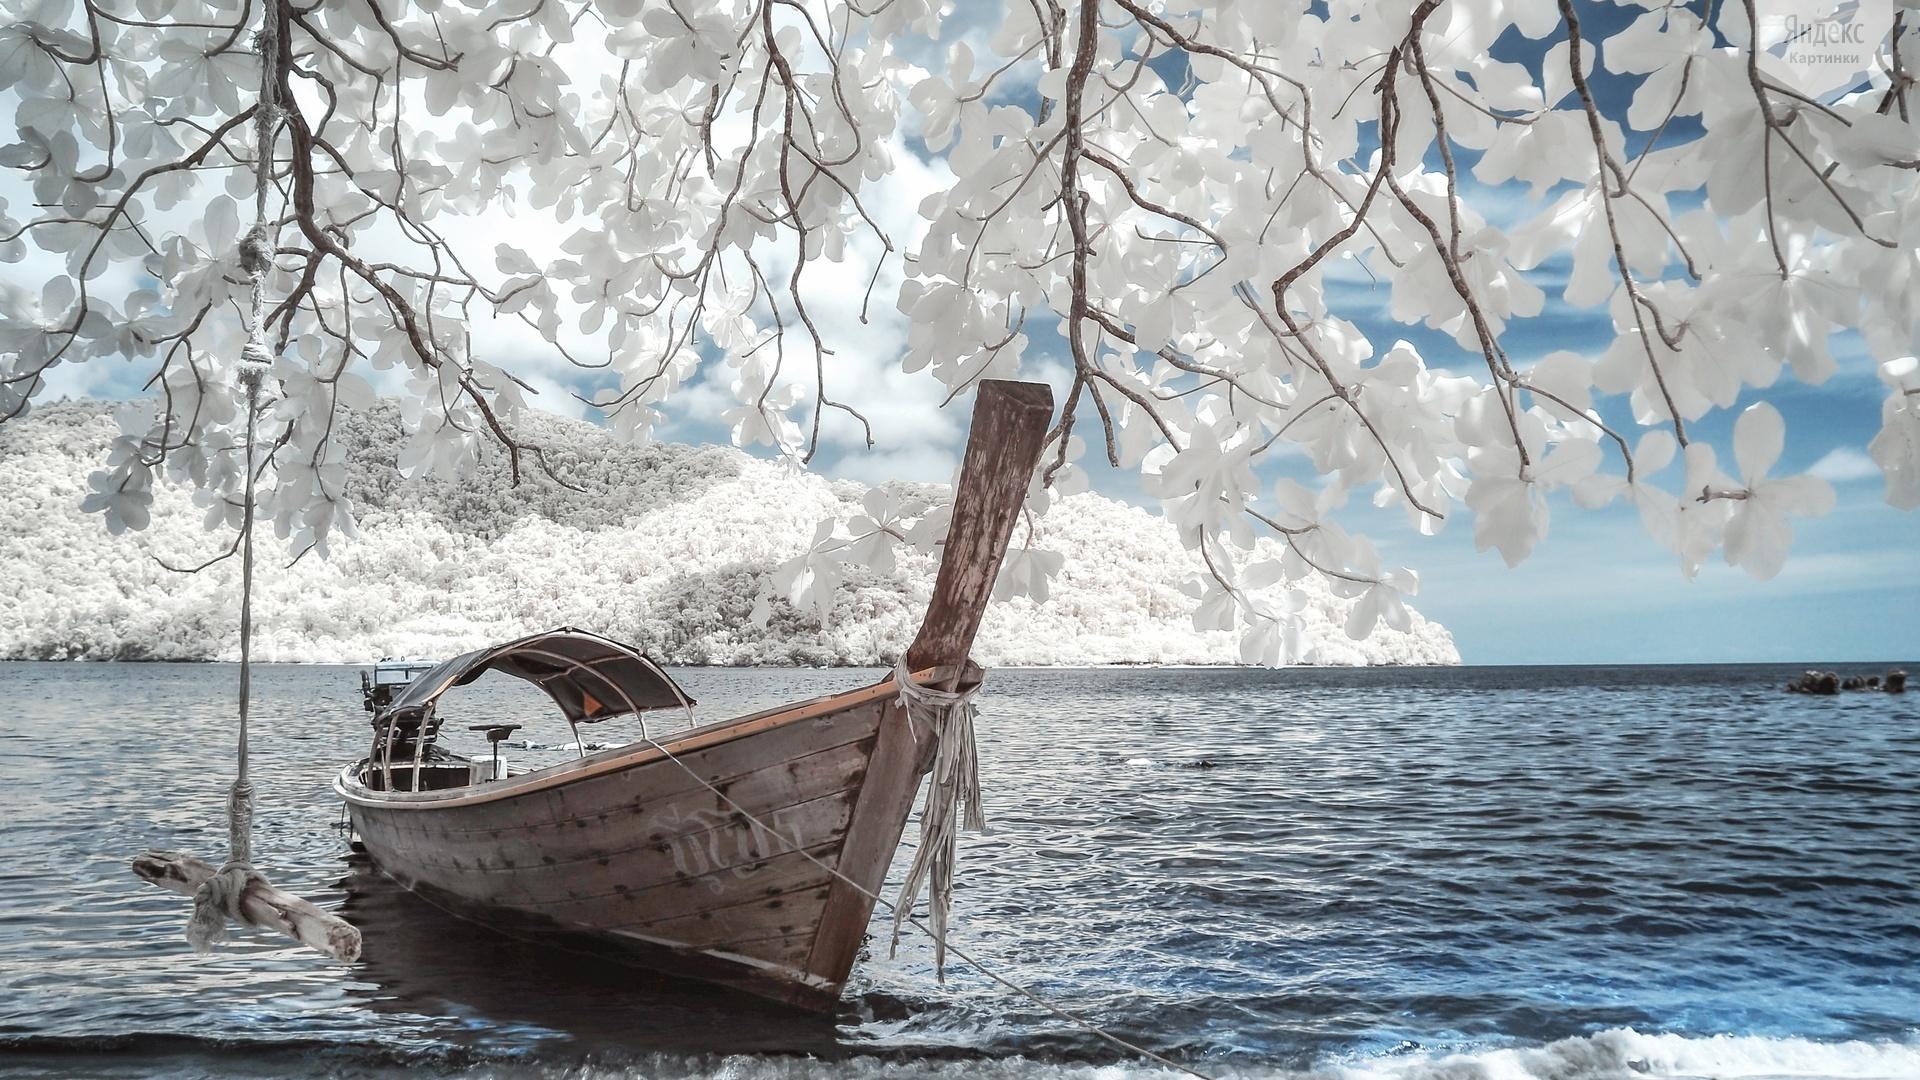 Boat Horizon Ocean 1920x1080